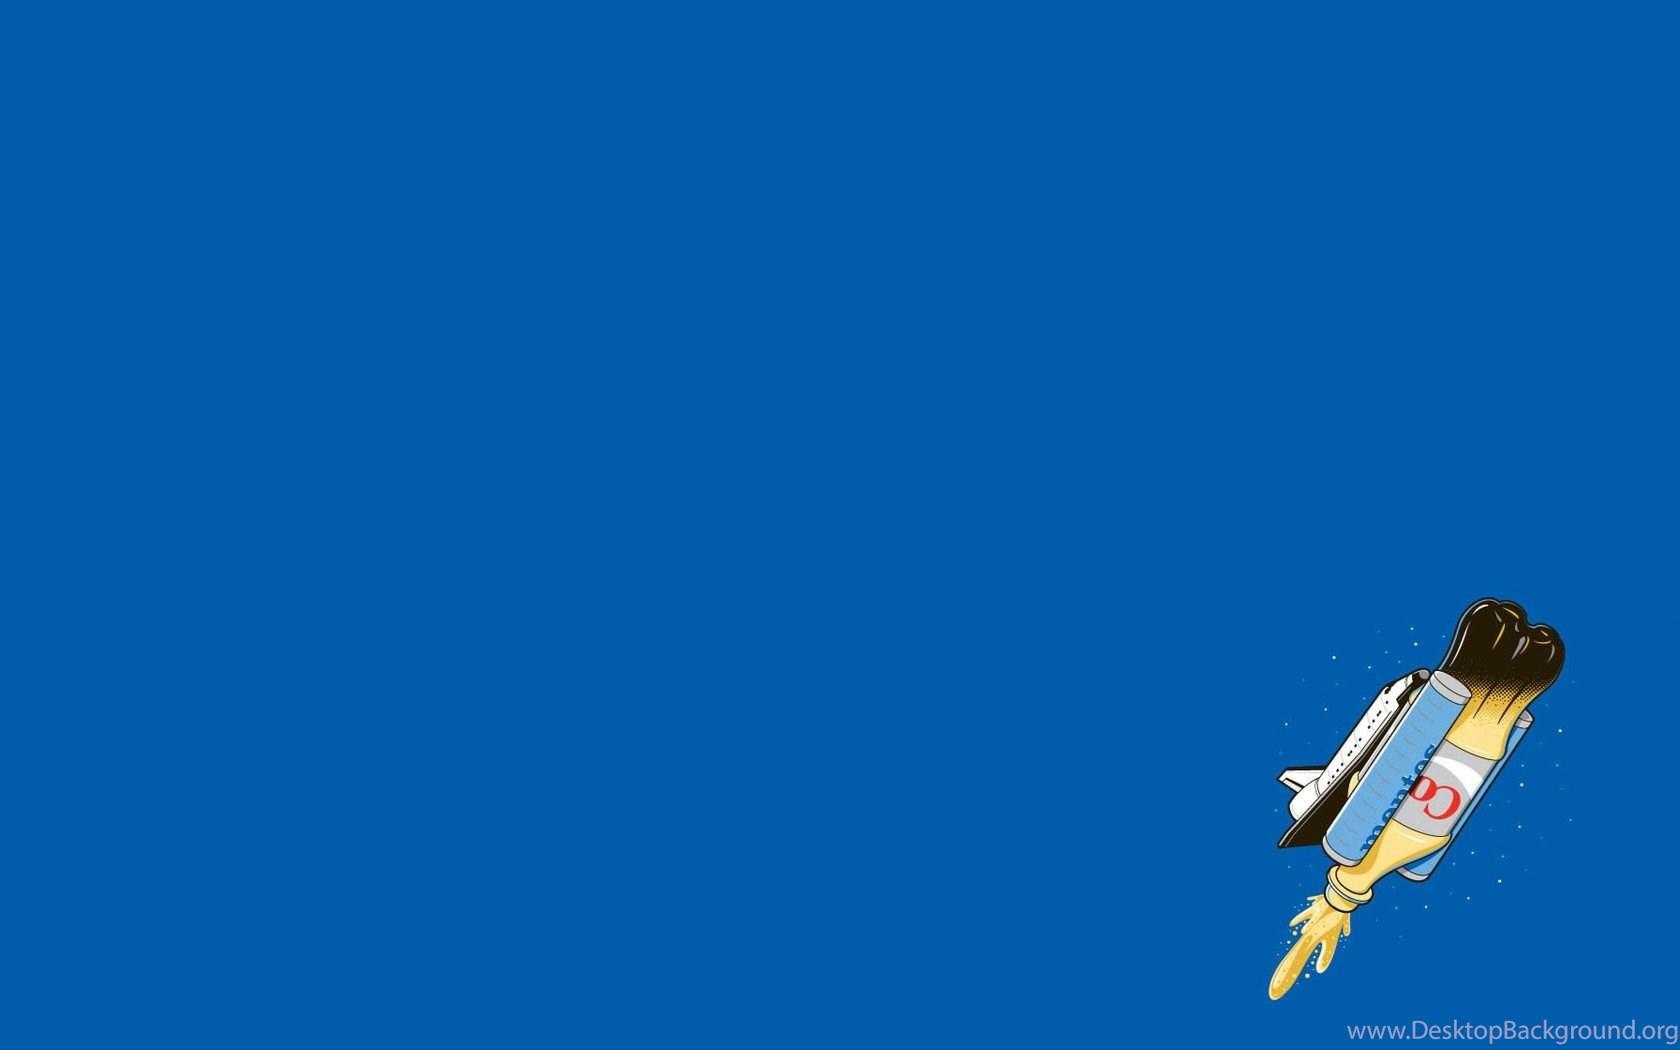 Blue Backgrounds Funny Wallpapers Desktop Background